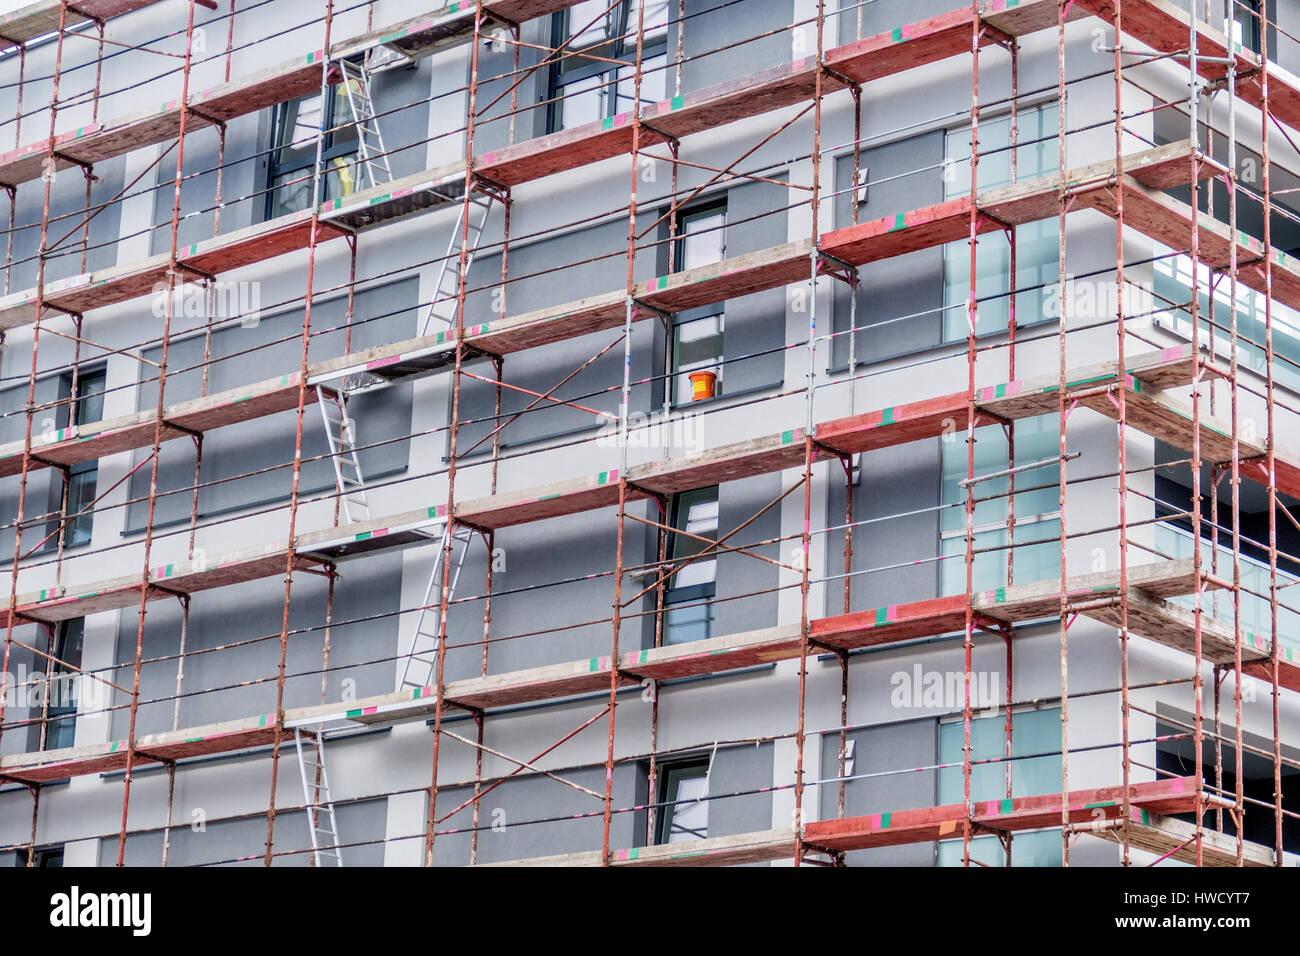 Bausparkredit Stockfotos & Bausparkredit Bilder - Alamy